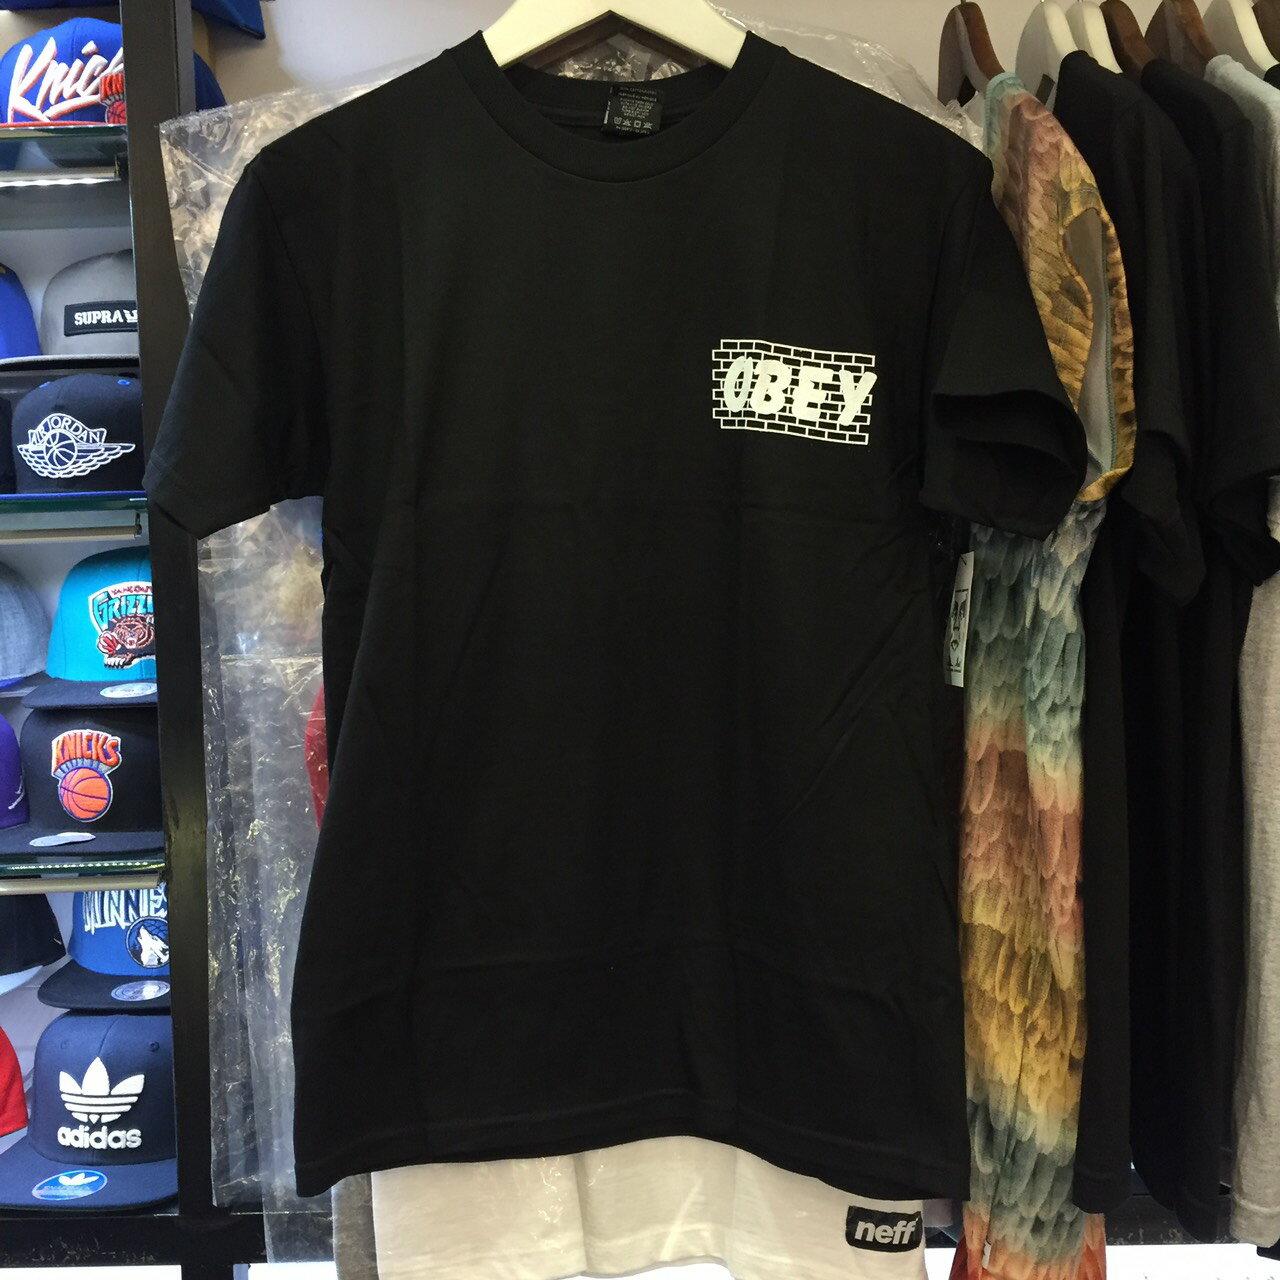 BEETLE PLUS 西門町經銷 全新 美國品牌 OBEY BRICK WALL TEE 磚牆 全黑 白字 黑白 LOGO 短T 163081179BLK OB-418 0